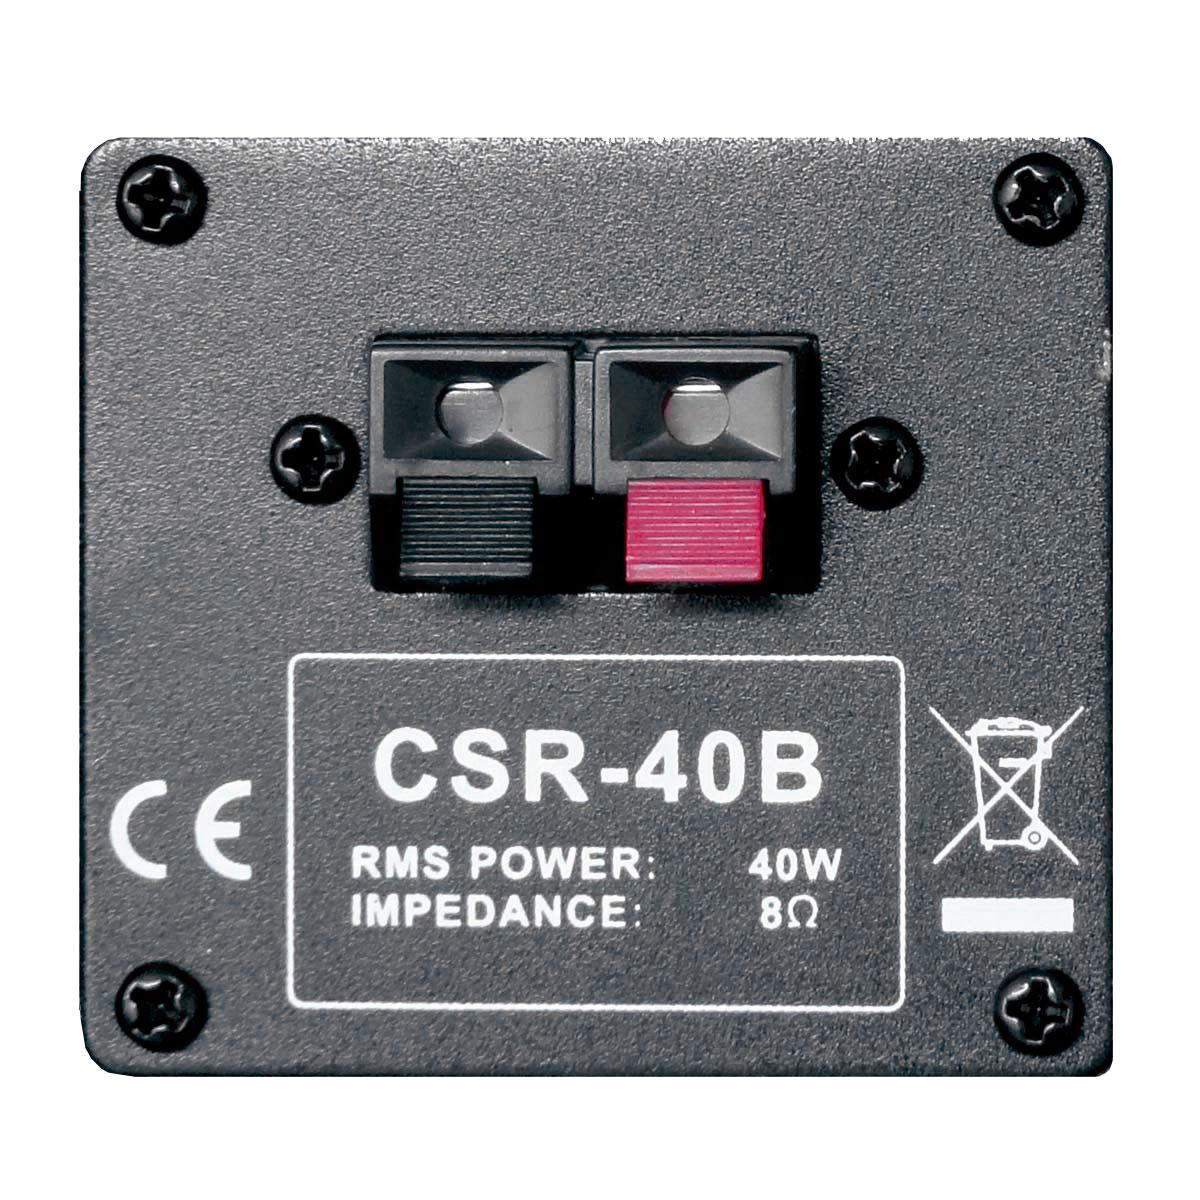 CSR40B - Caixa Passiva 40W Preta c/ Suporte ( Par ) CSR 40 B - CSR